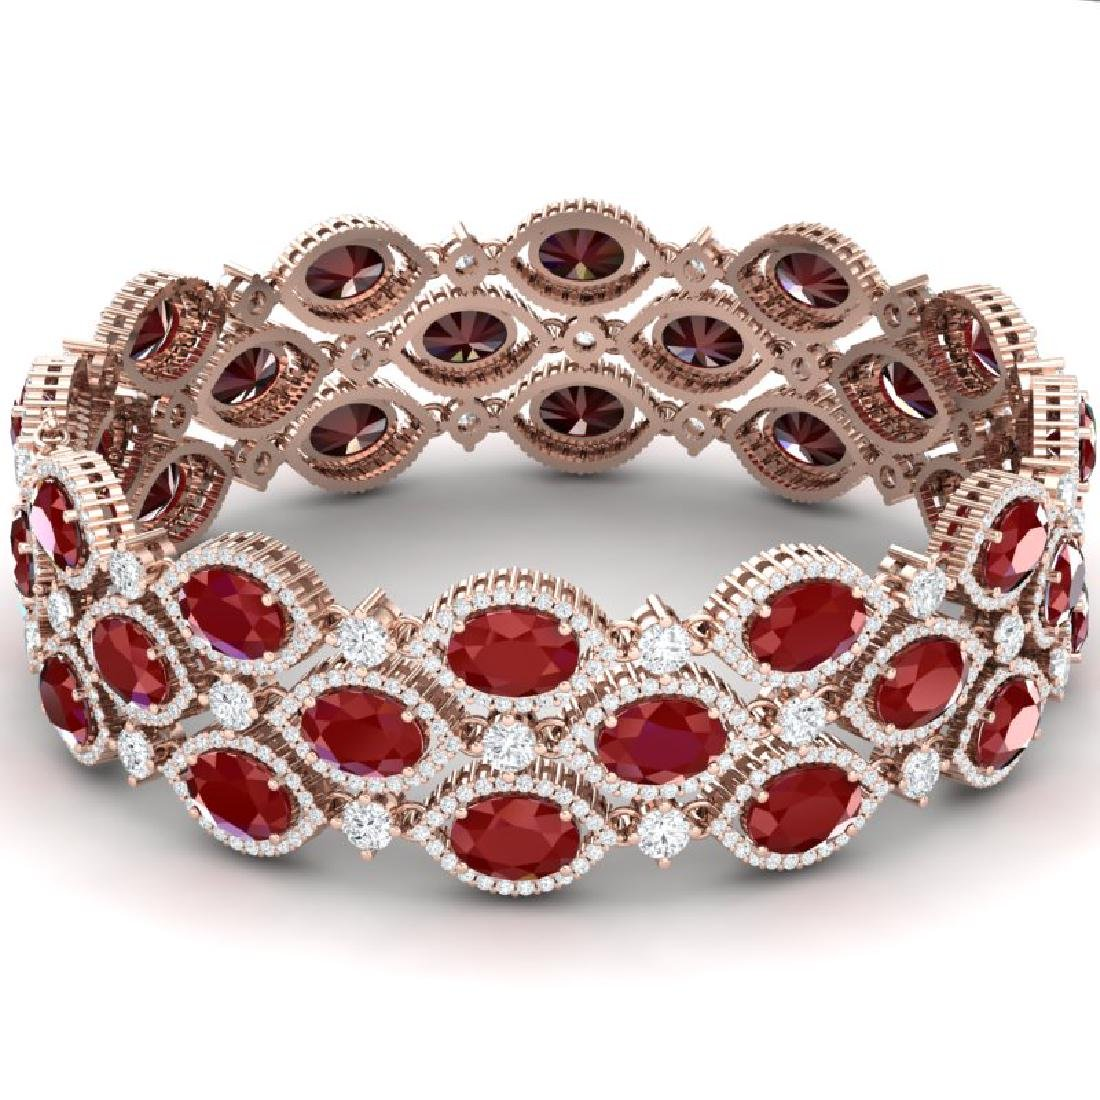 47.84 CTW Royalty Ruby & VS Diamond Bracelet 18K Rose - 3